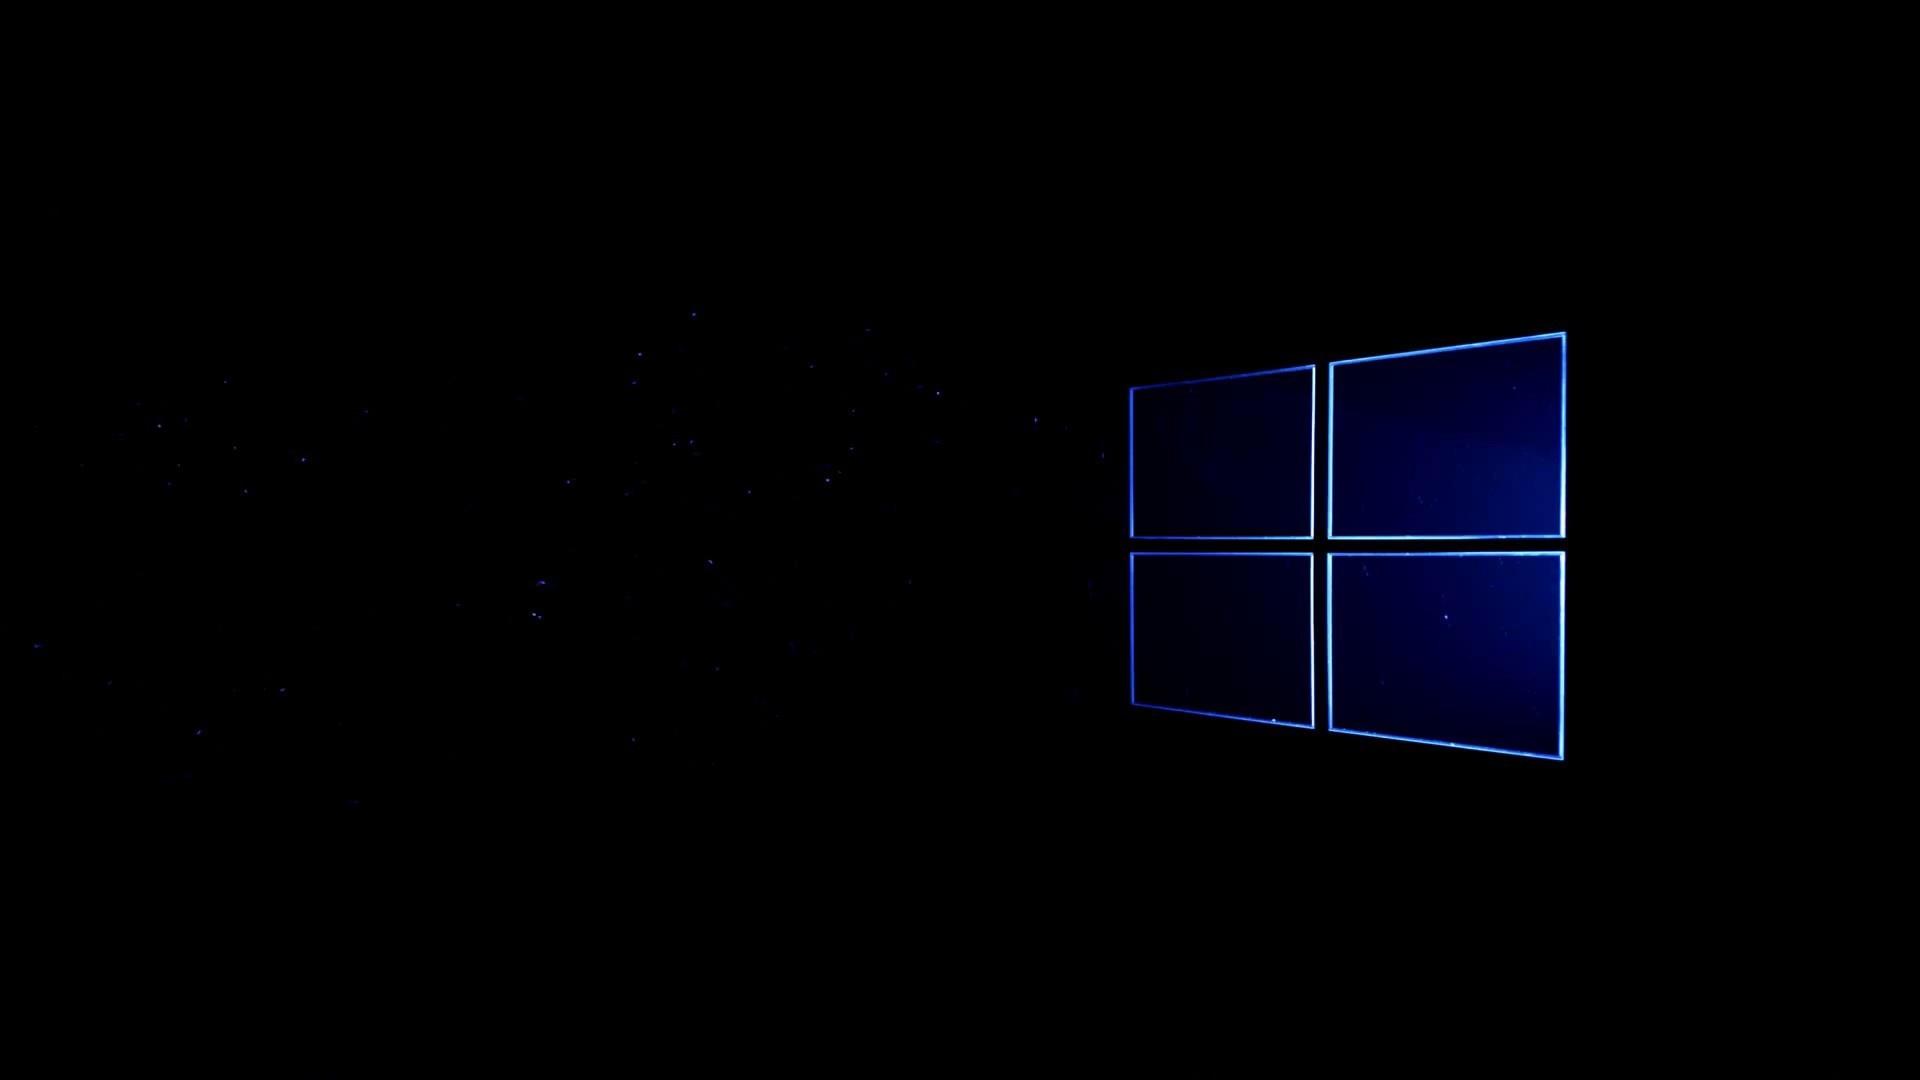 Black Wallpaper Windows 10 (61+ images)